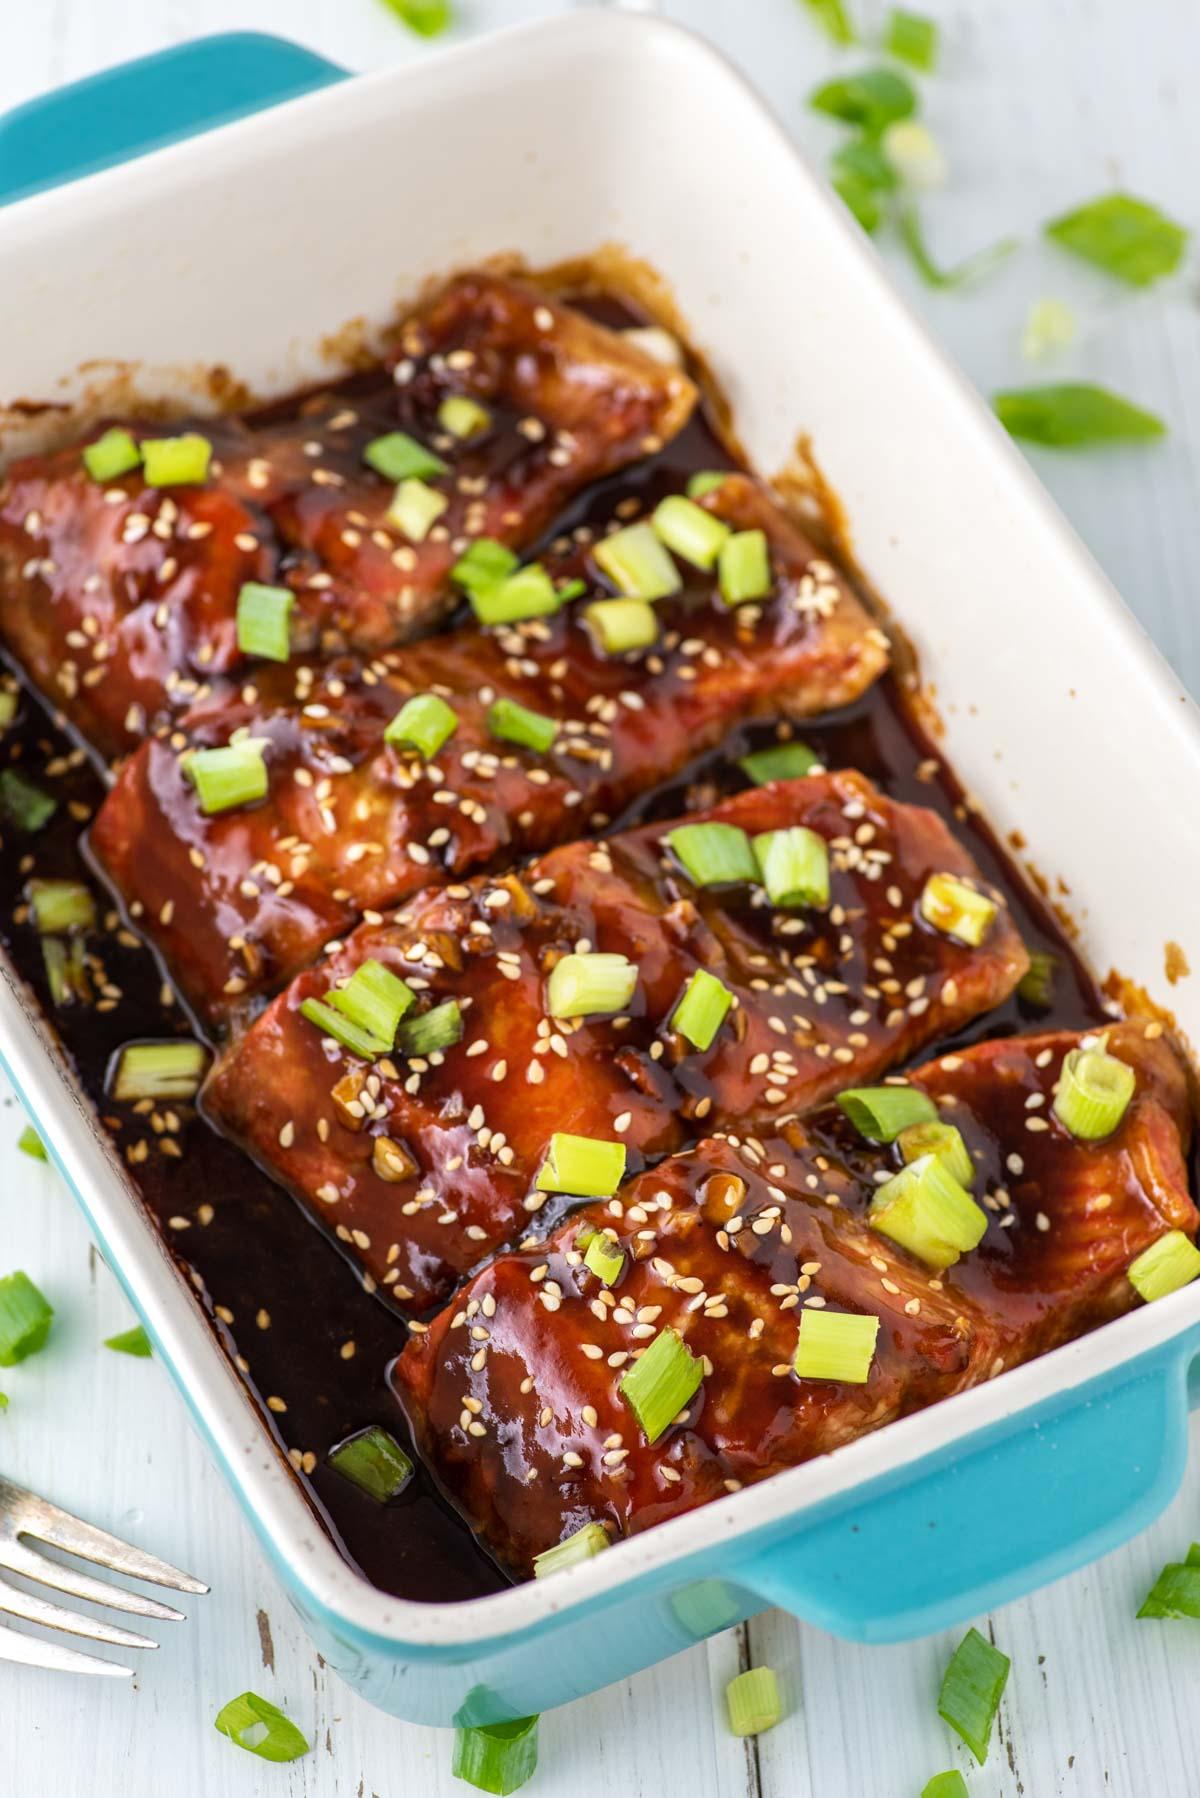 4 pieces of salmon in teriyaki sauce in baking dish